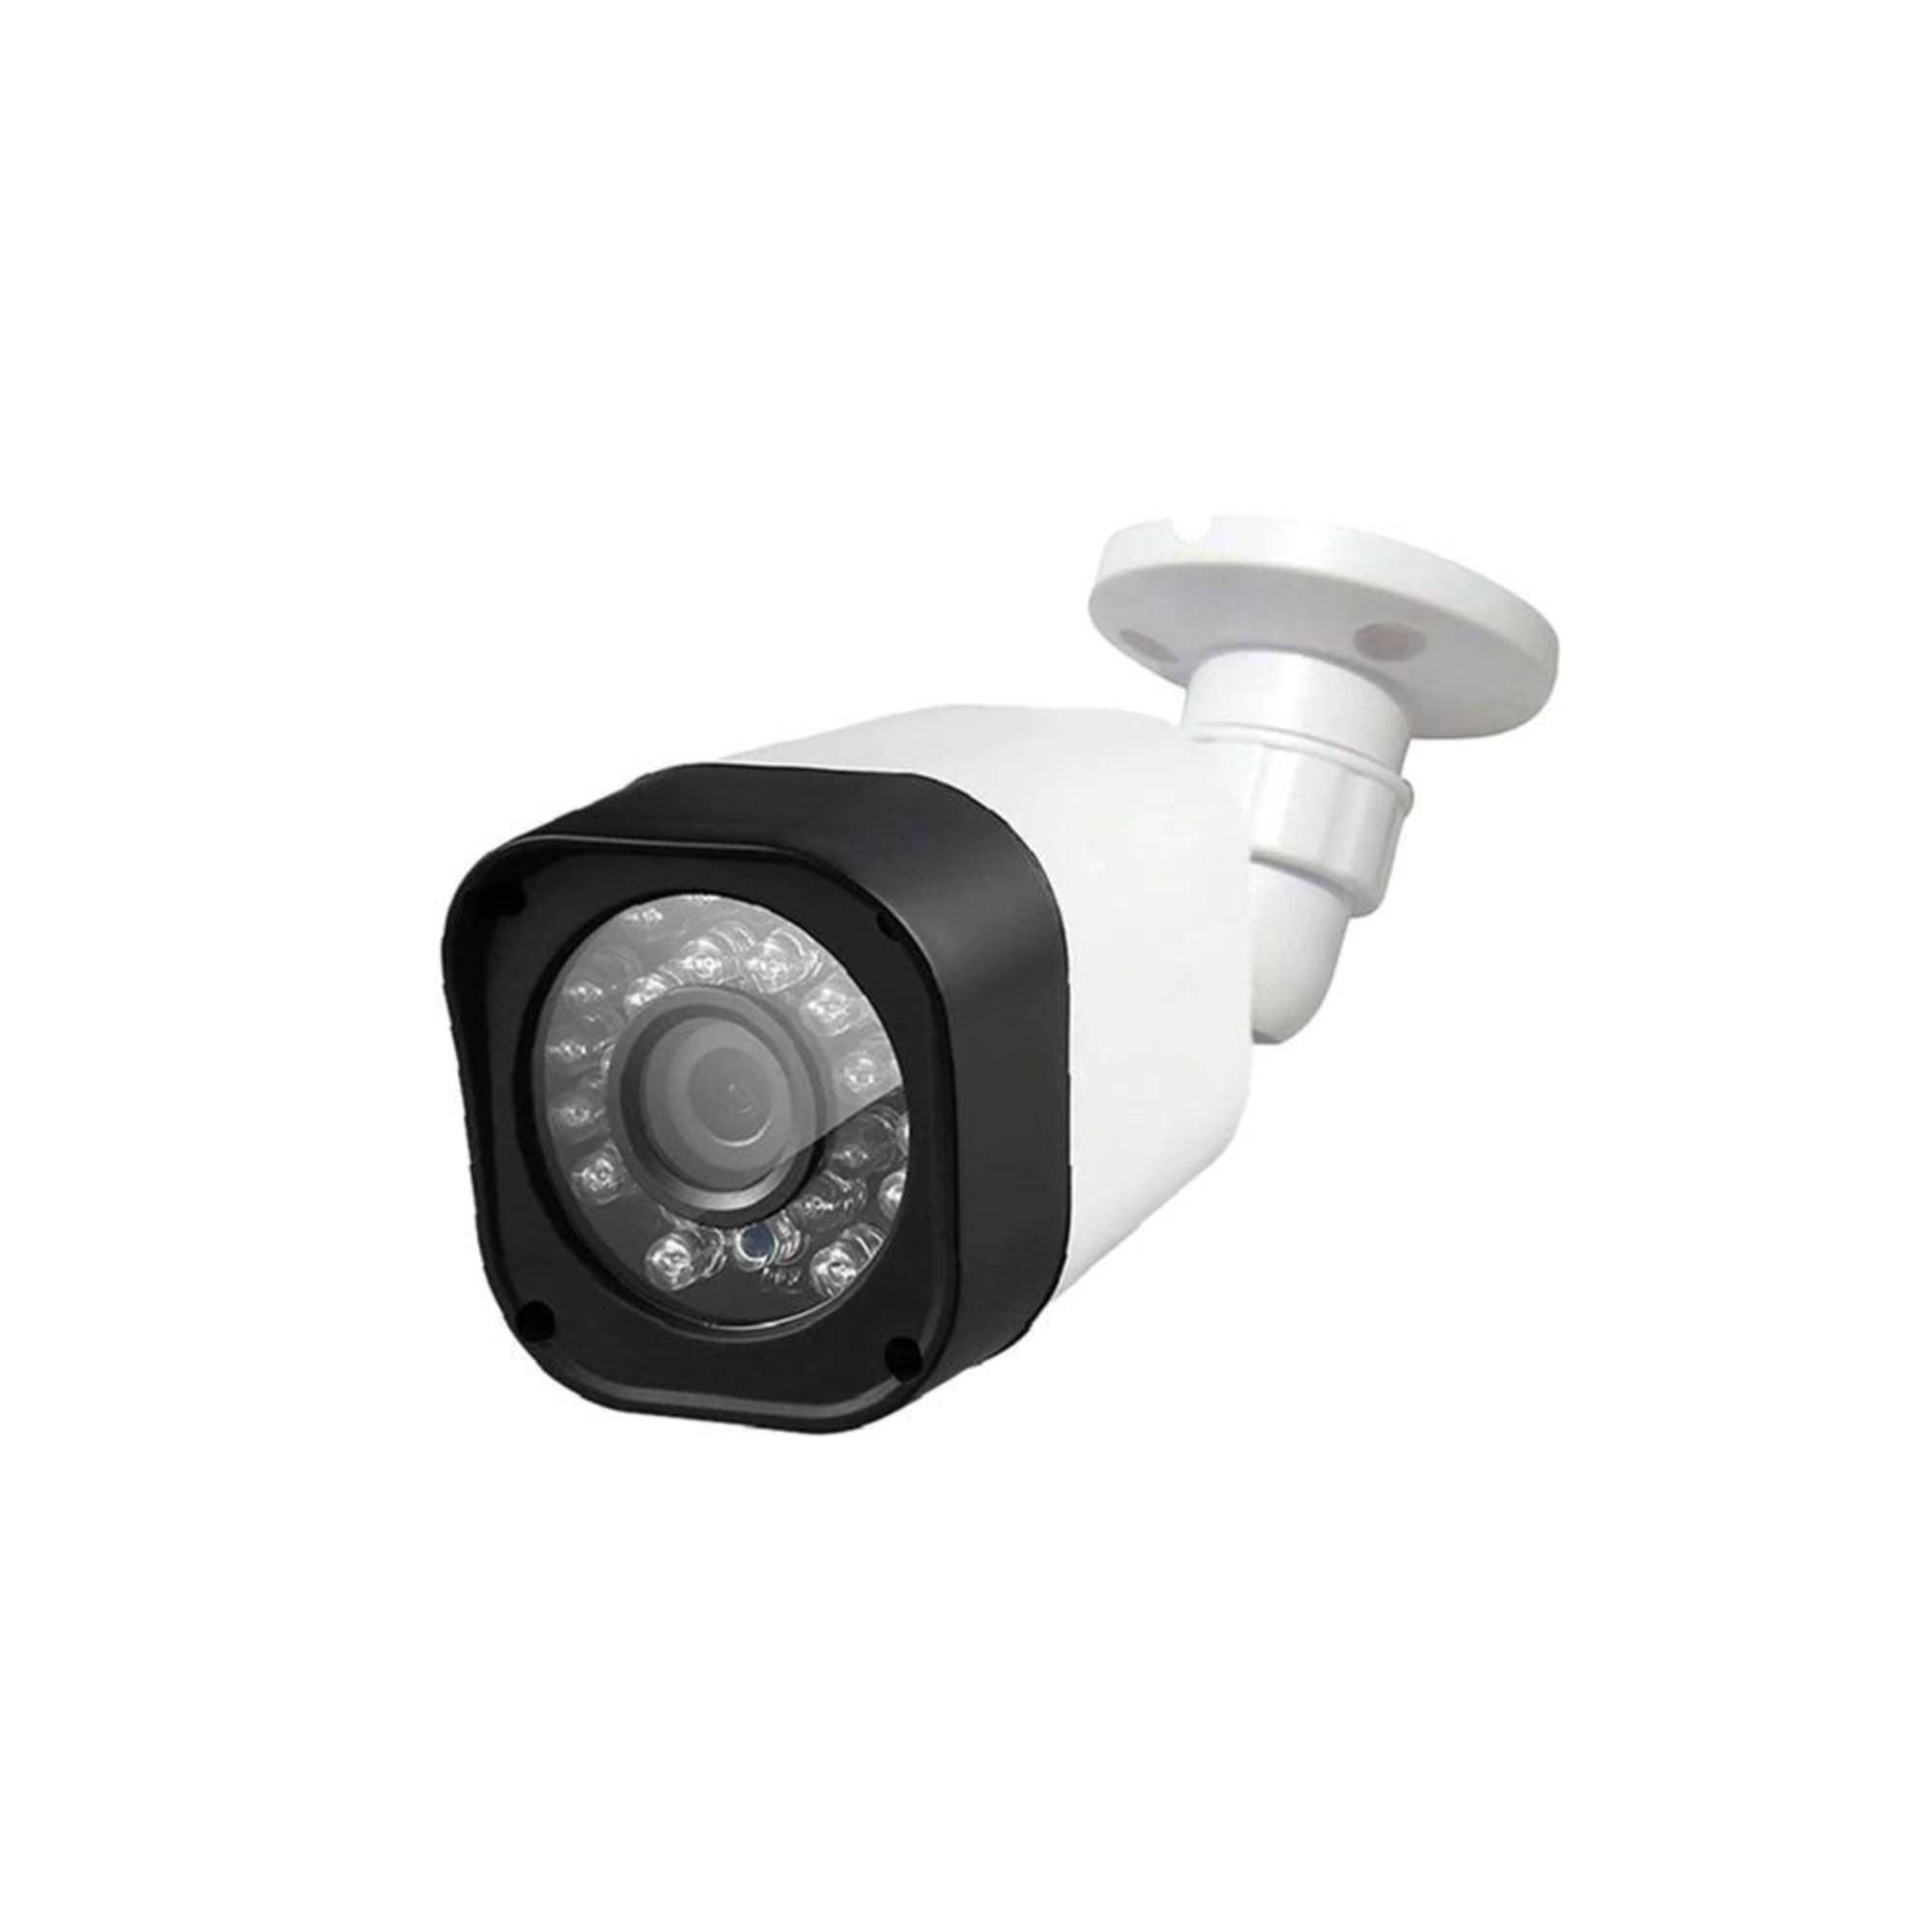 Câmera Infravermelho JL Protec AHD1020 2MP Full HD